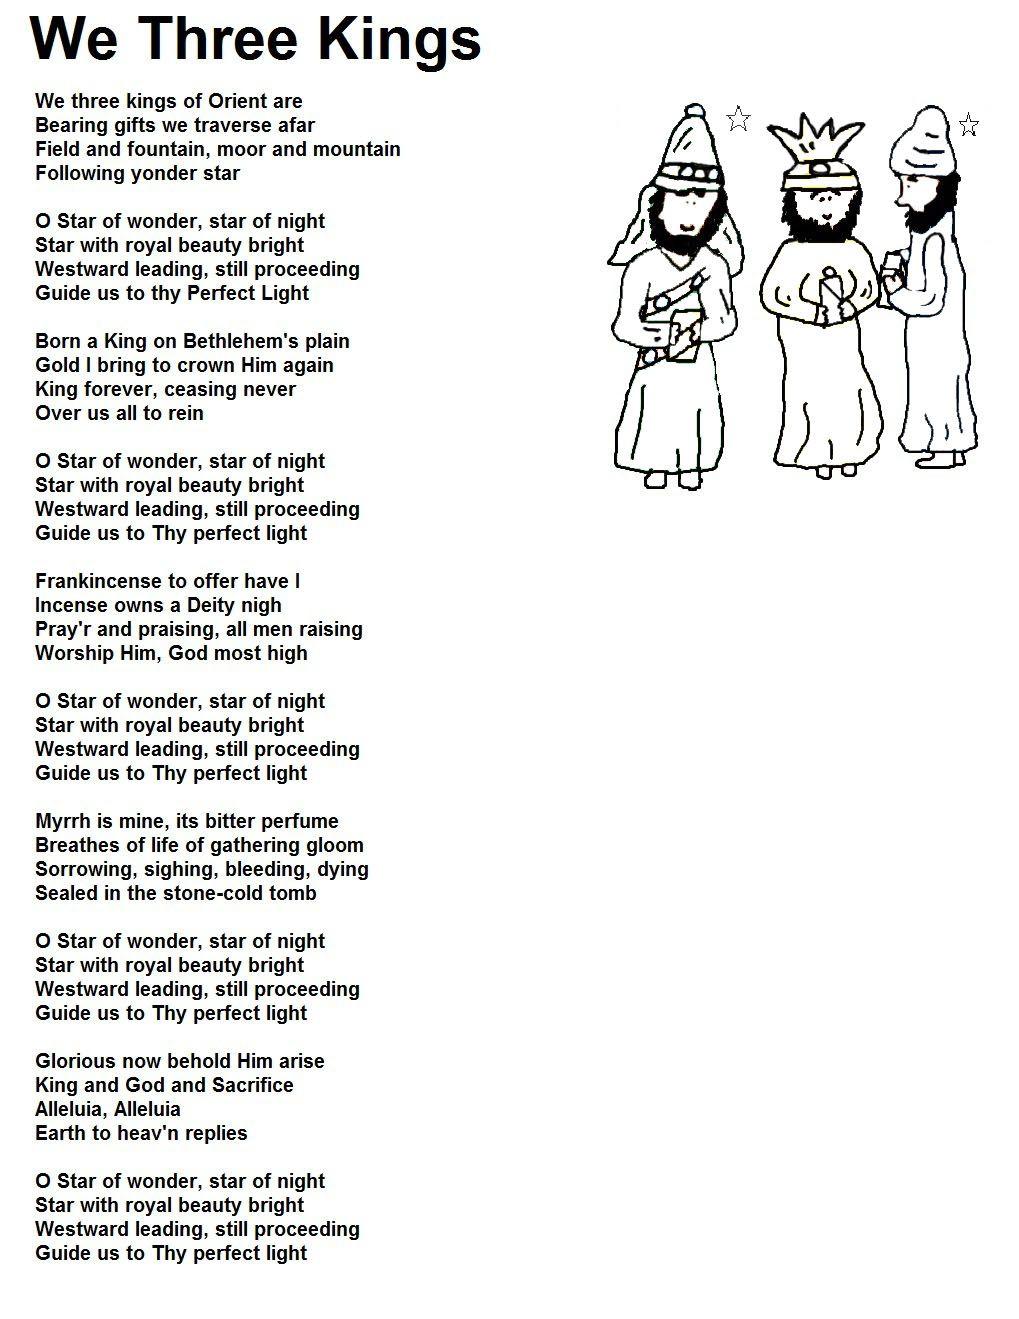 We three kings We three kings, Christmas songs lyrics